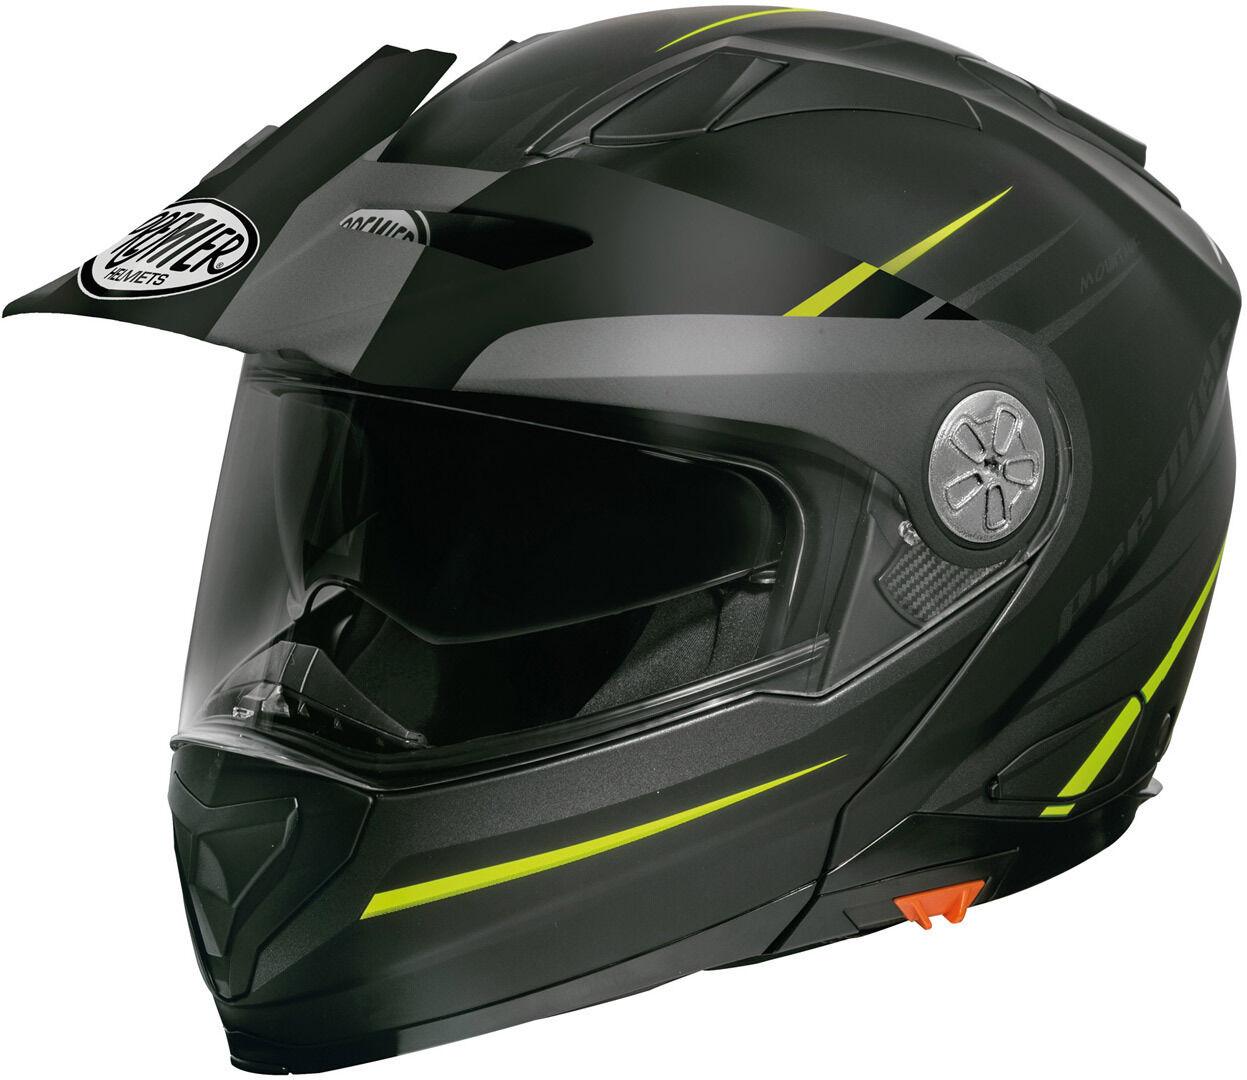 Premier Xtrail MOY BM Helmet Kypärä  - Musta Vihreä - Size: L